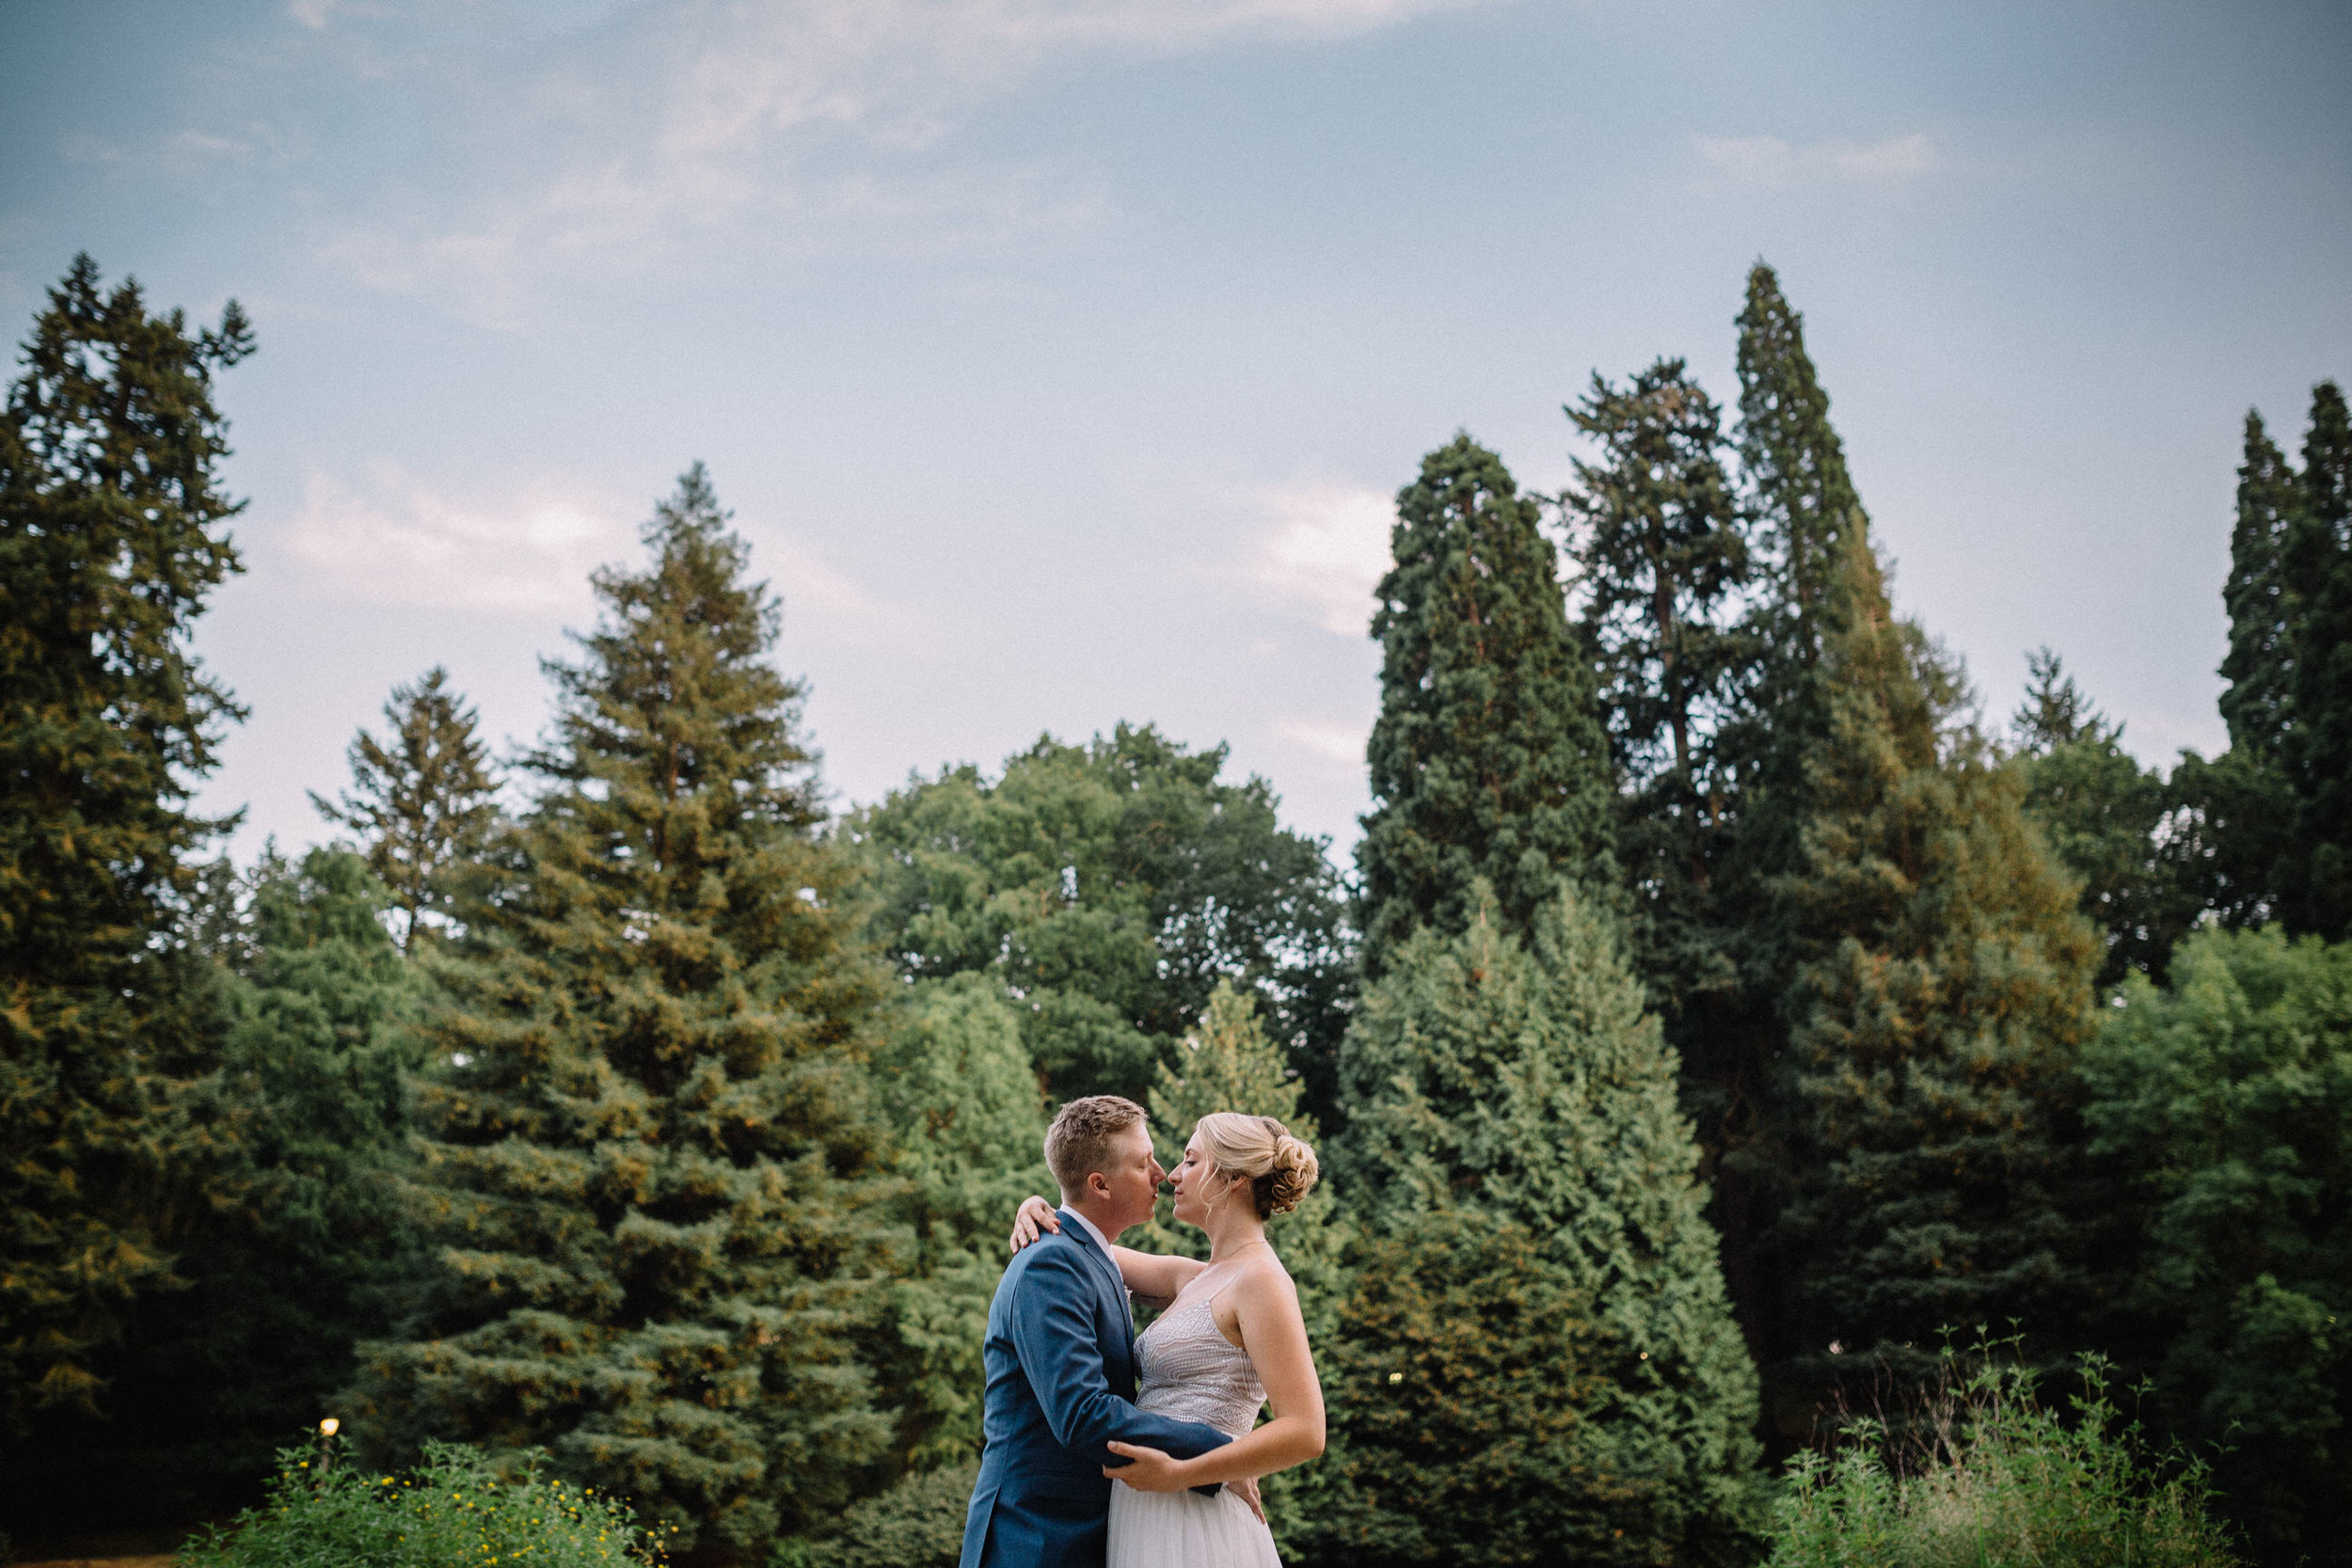 Laurelhurst Park club wedding photographer Portand pdx Oregon134.JPG